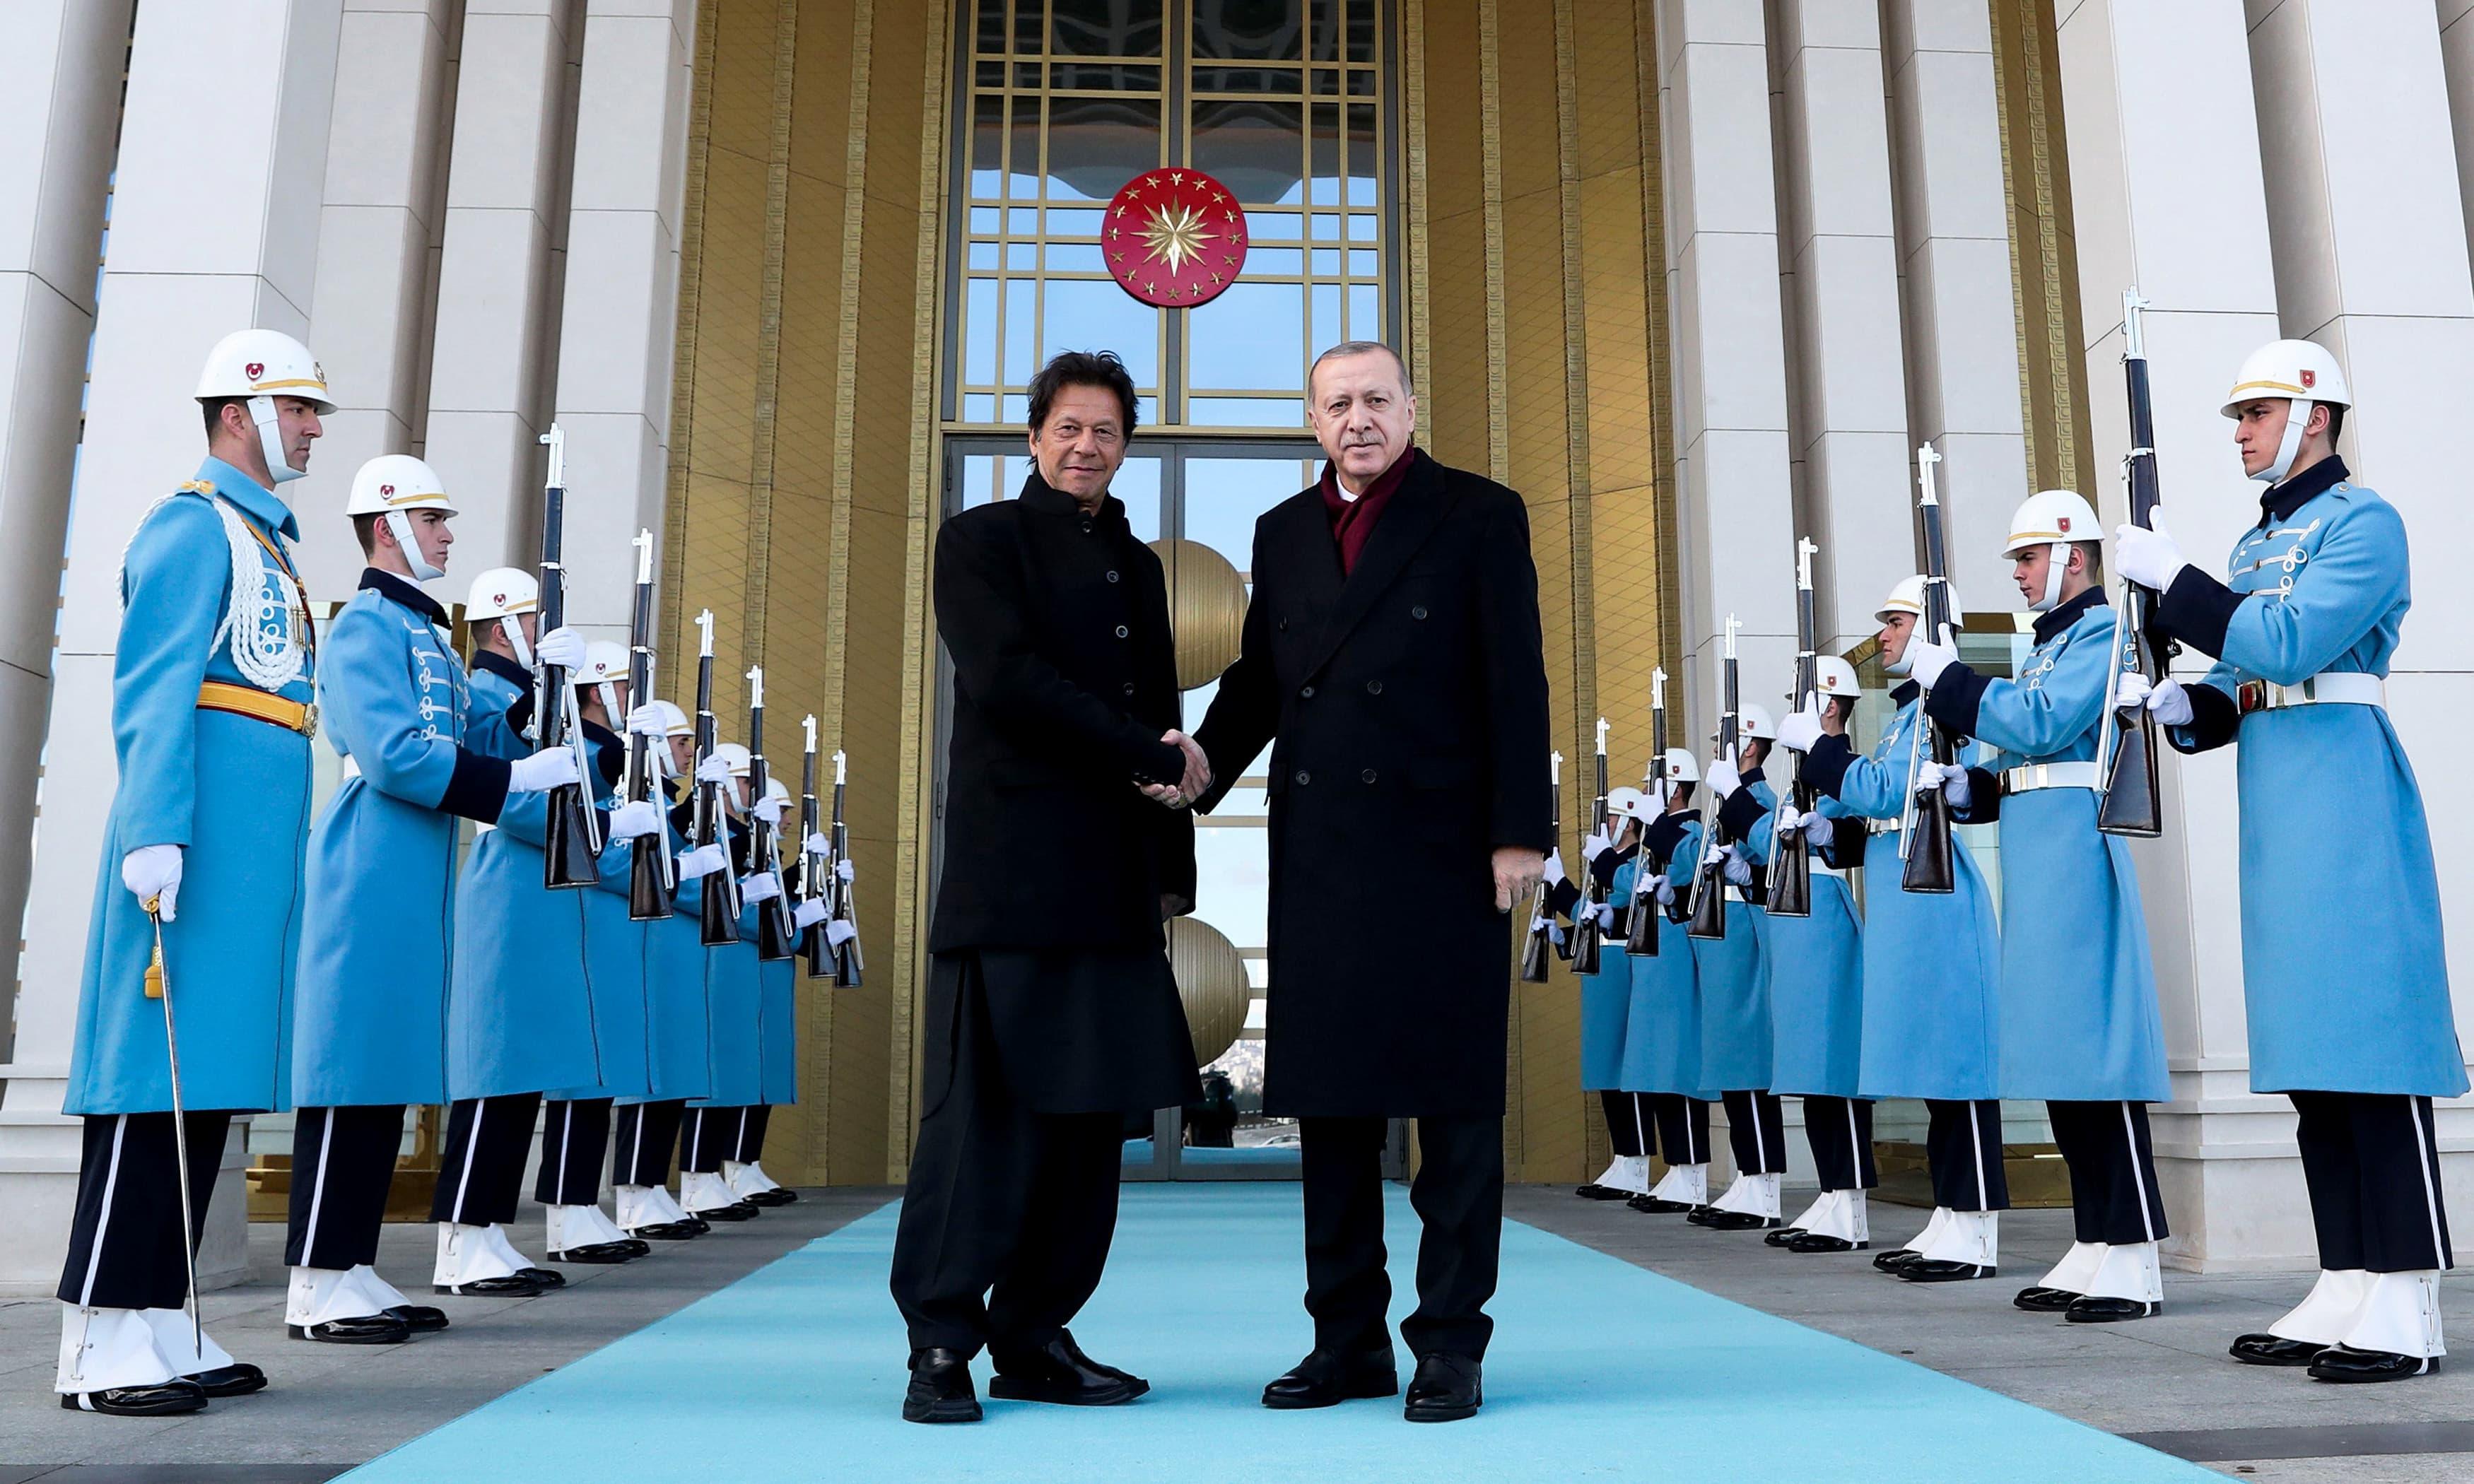 Turkish President Recep Tayyip Erdogan welcomes PM Imran Khan ahead of their meeting at the Presidential Complex in Ankara. —AFP